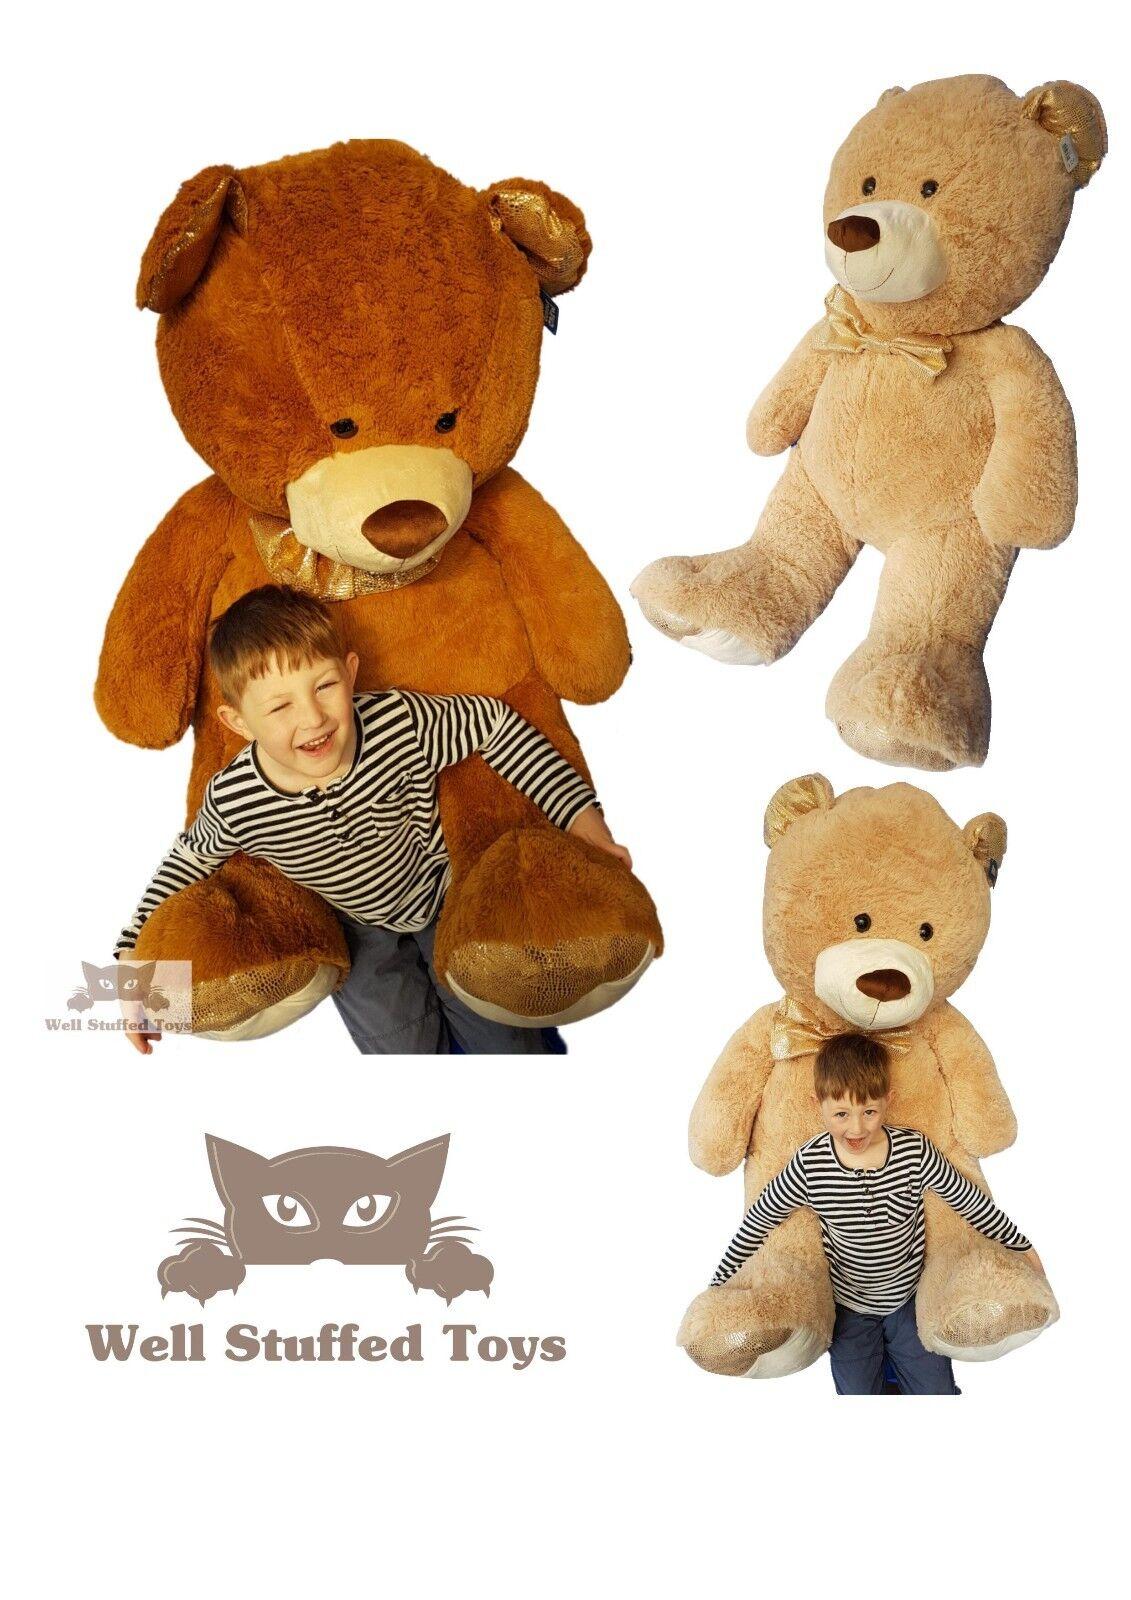 Large Teddy Teddy Bear Giant Teddy Bears Big Soft Plush 105cm Quality golden Paws